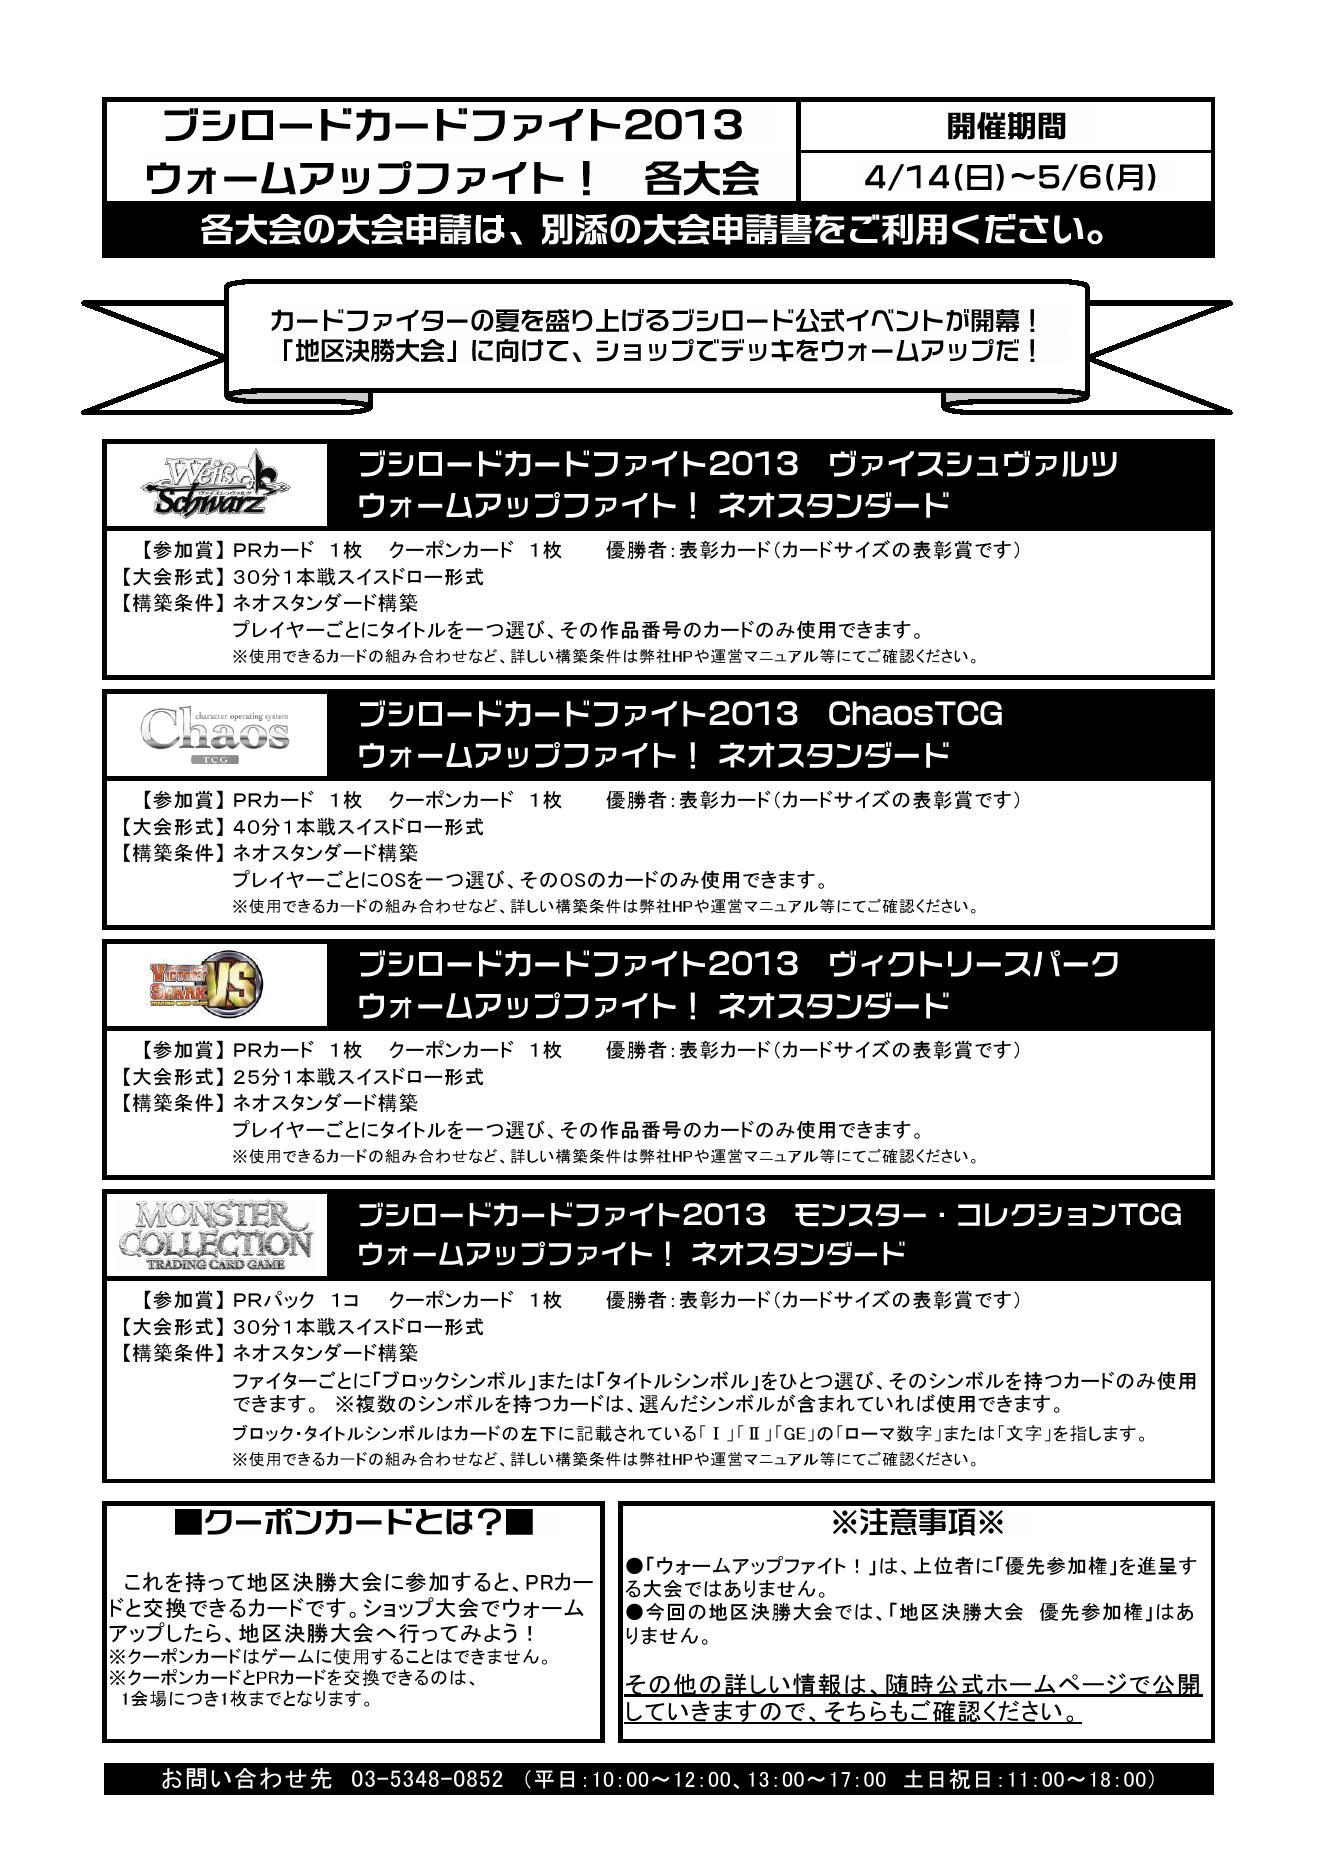 bcf2013_wuf_inst0001.jpg